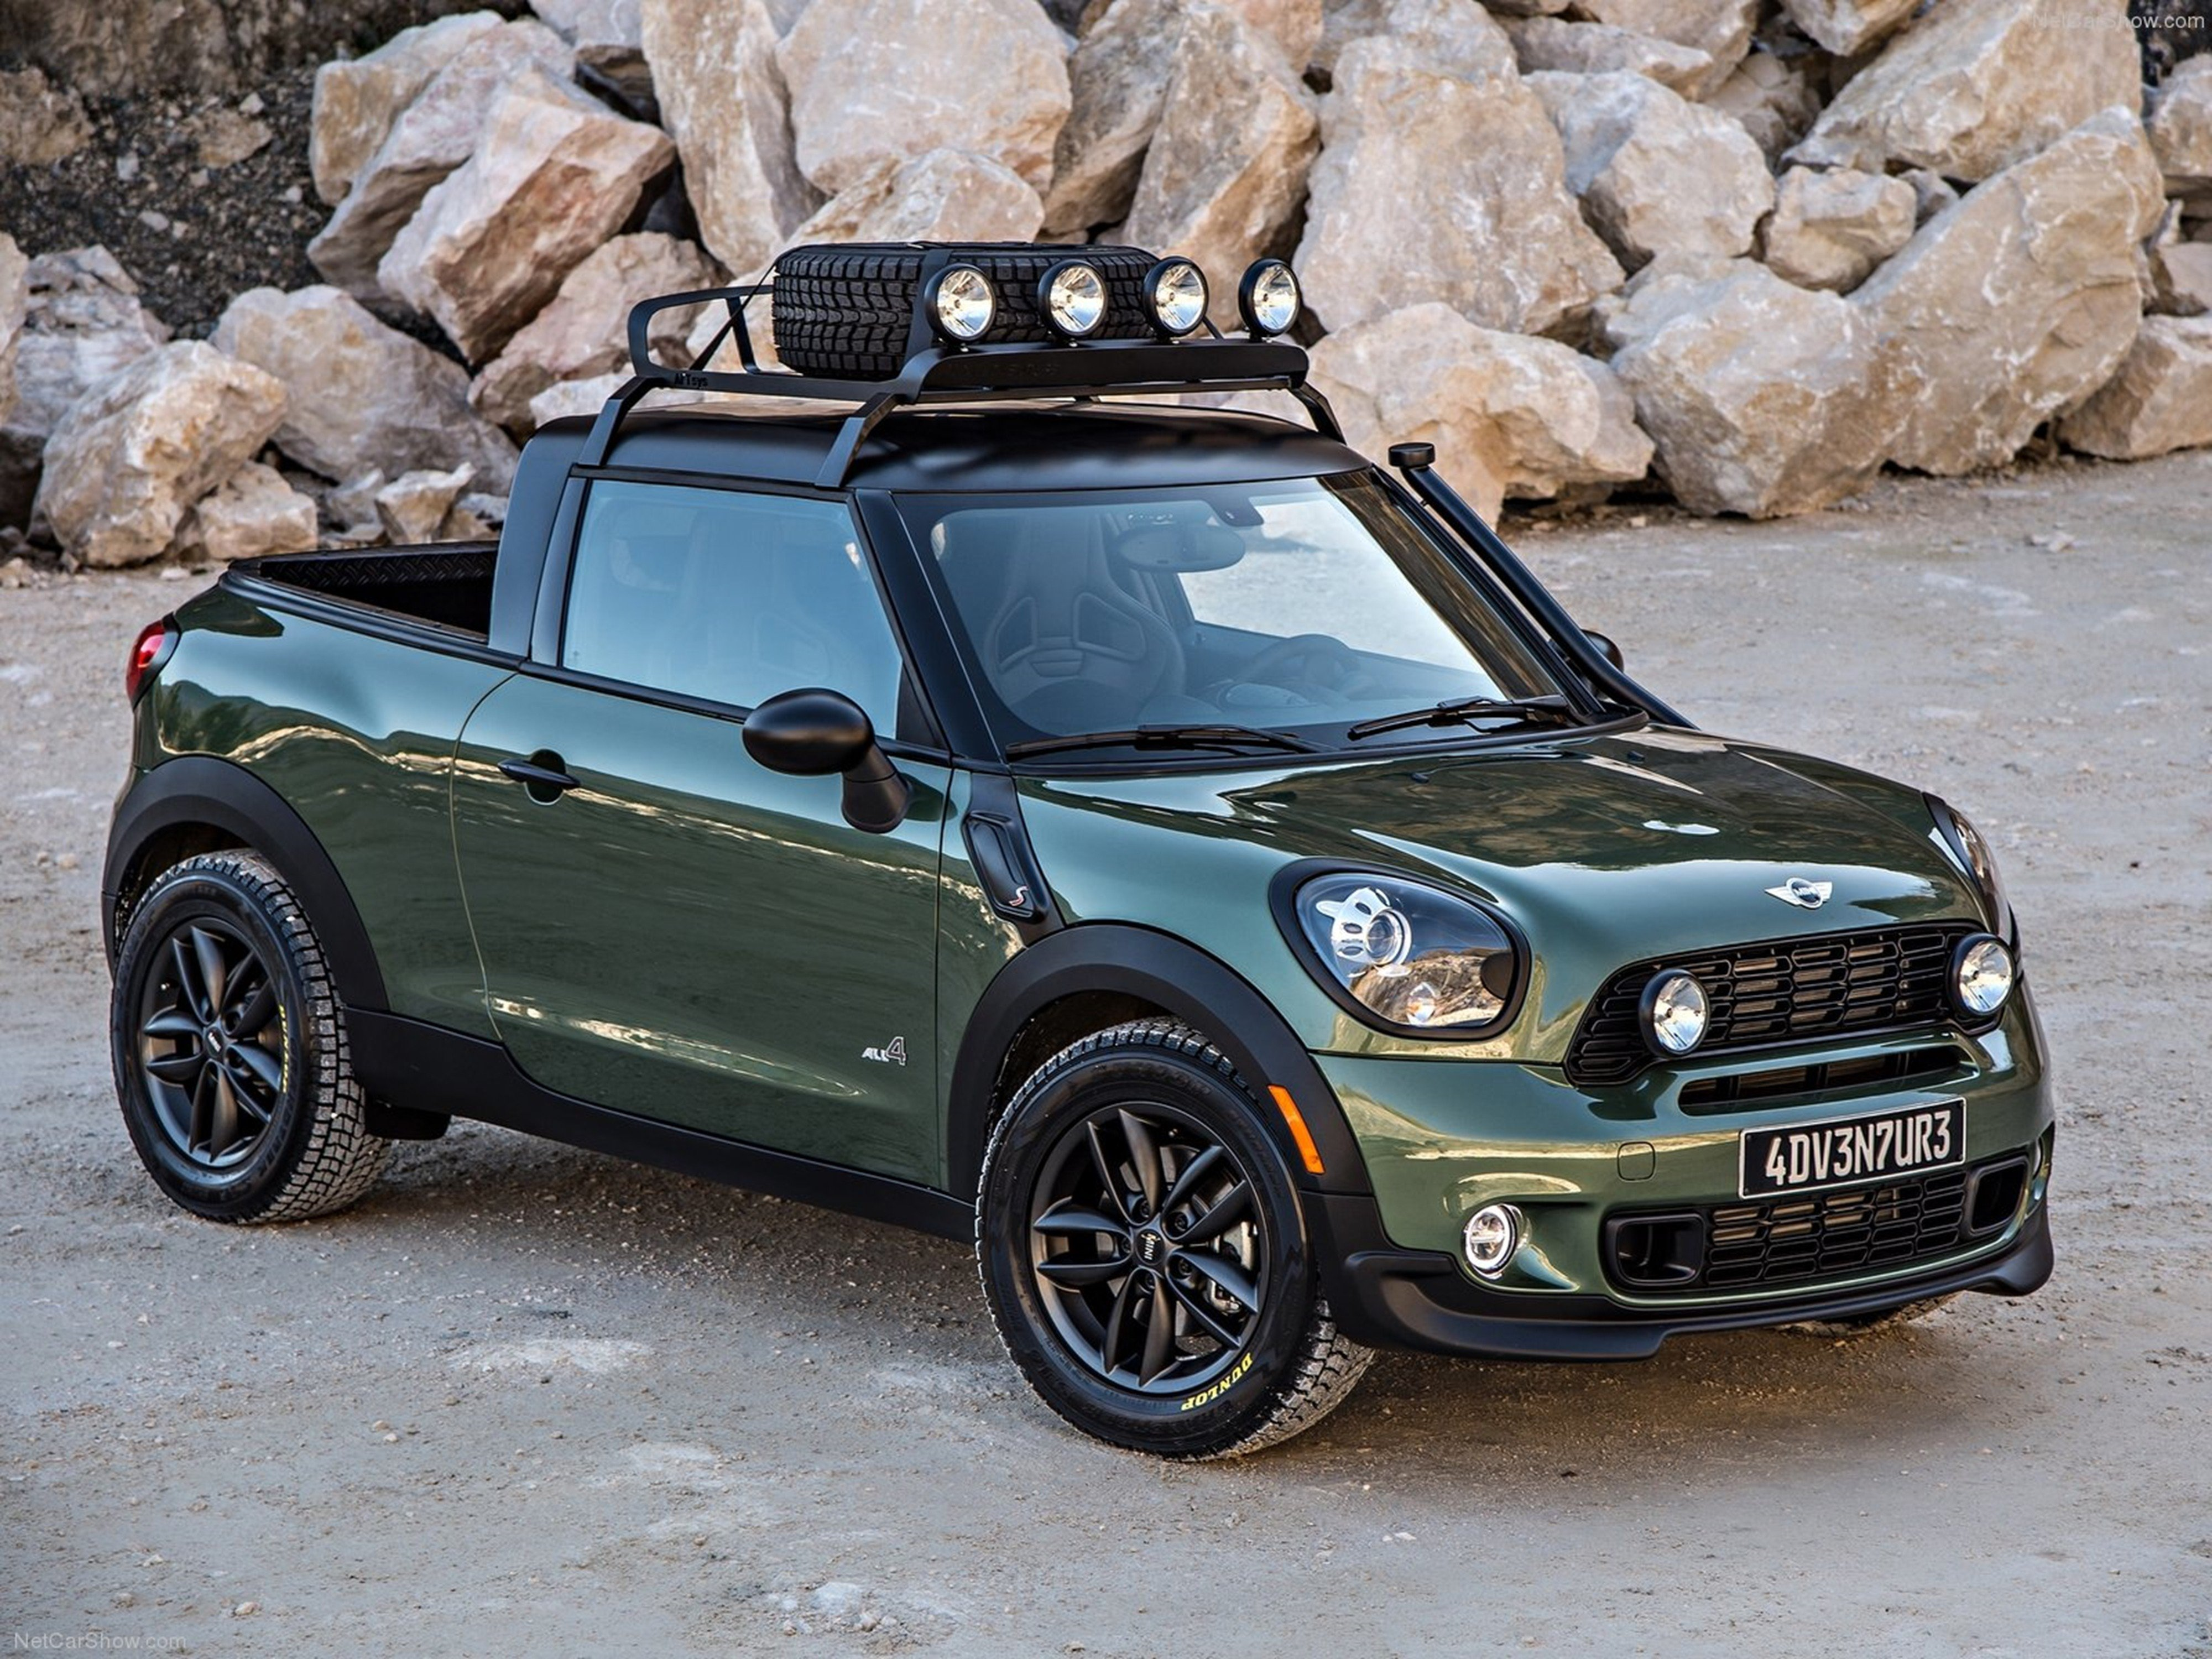 mini paceman adventure concept 2014 car 4x4 off road. Black Bedroom Furniture Sets. Home Design Ideas